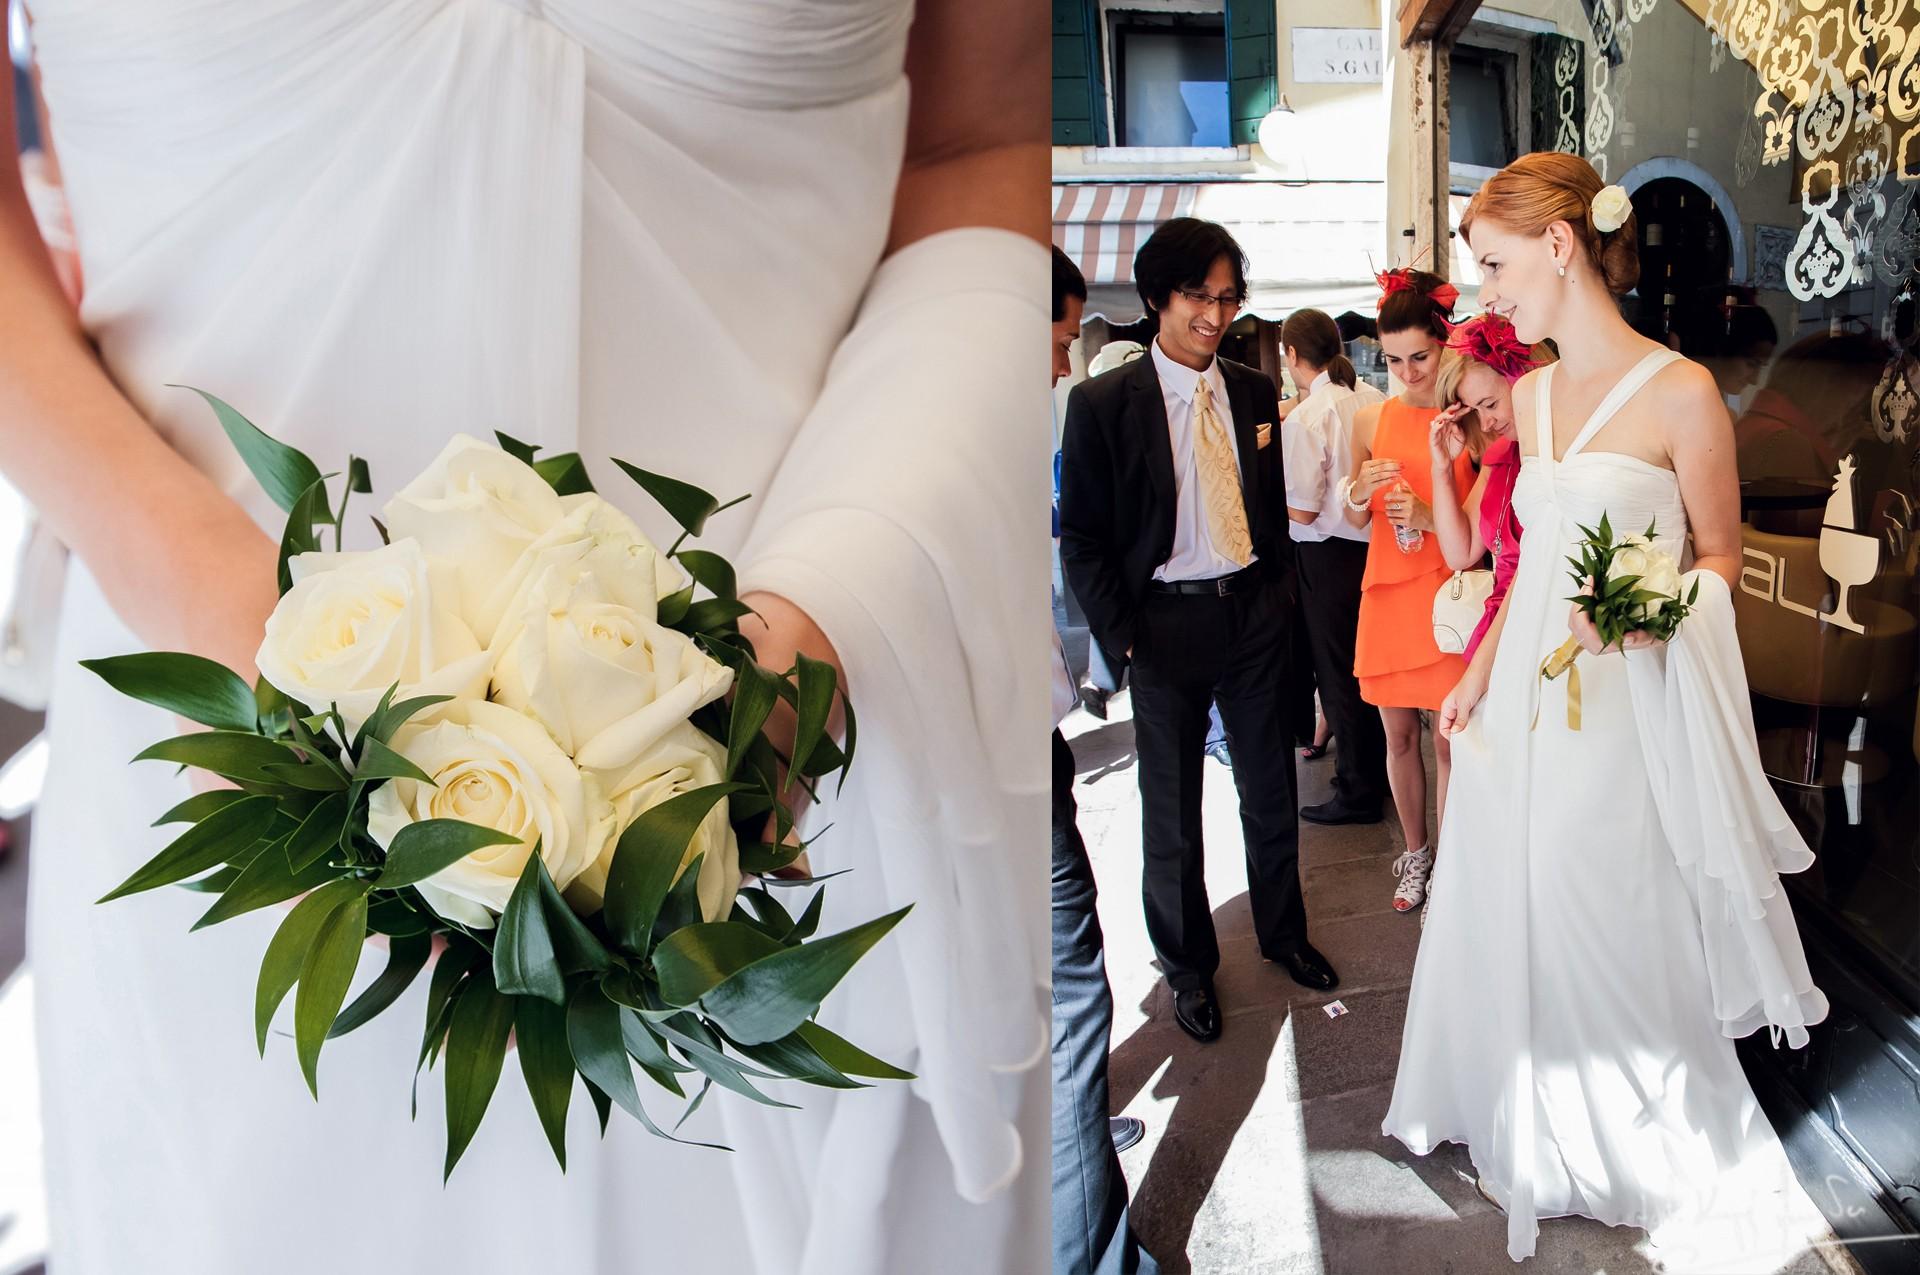 Ślub w wenecji 55 Manuela Luiza & Young Seon Song